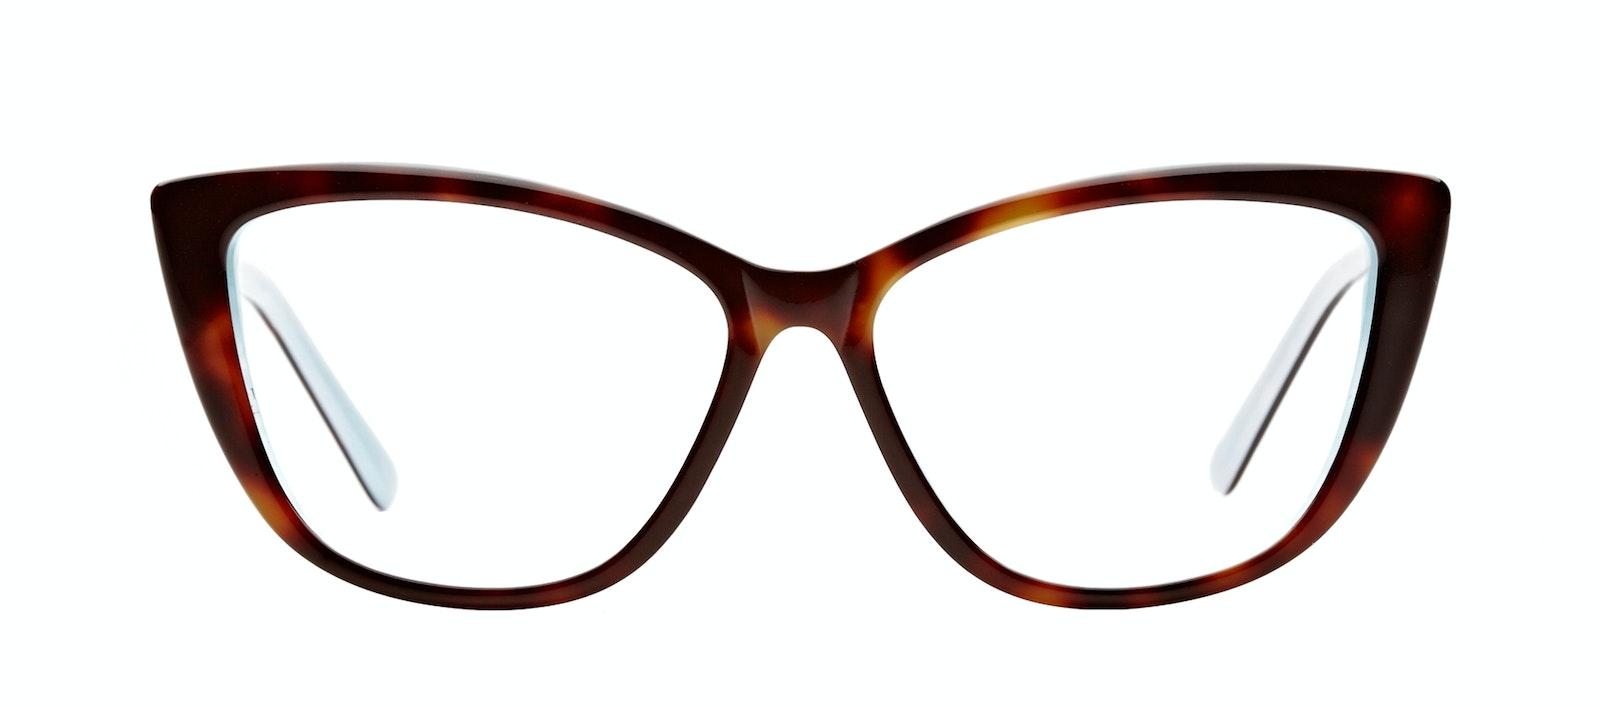 766d1f63f48b Dolled Up. Previous. Affordable Fashion Glasses Cat Eye Daring Cateye  Eyeglasses Women ...